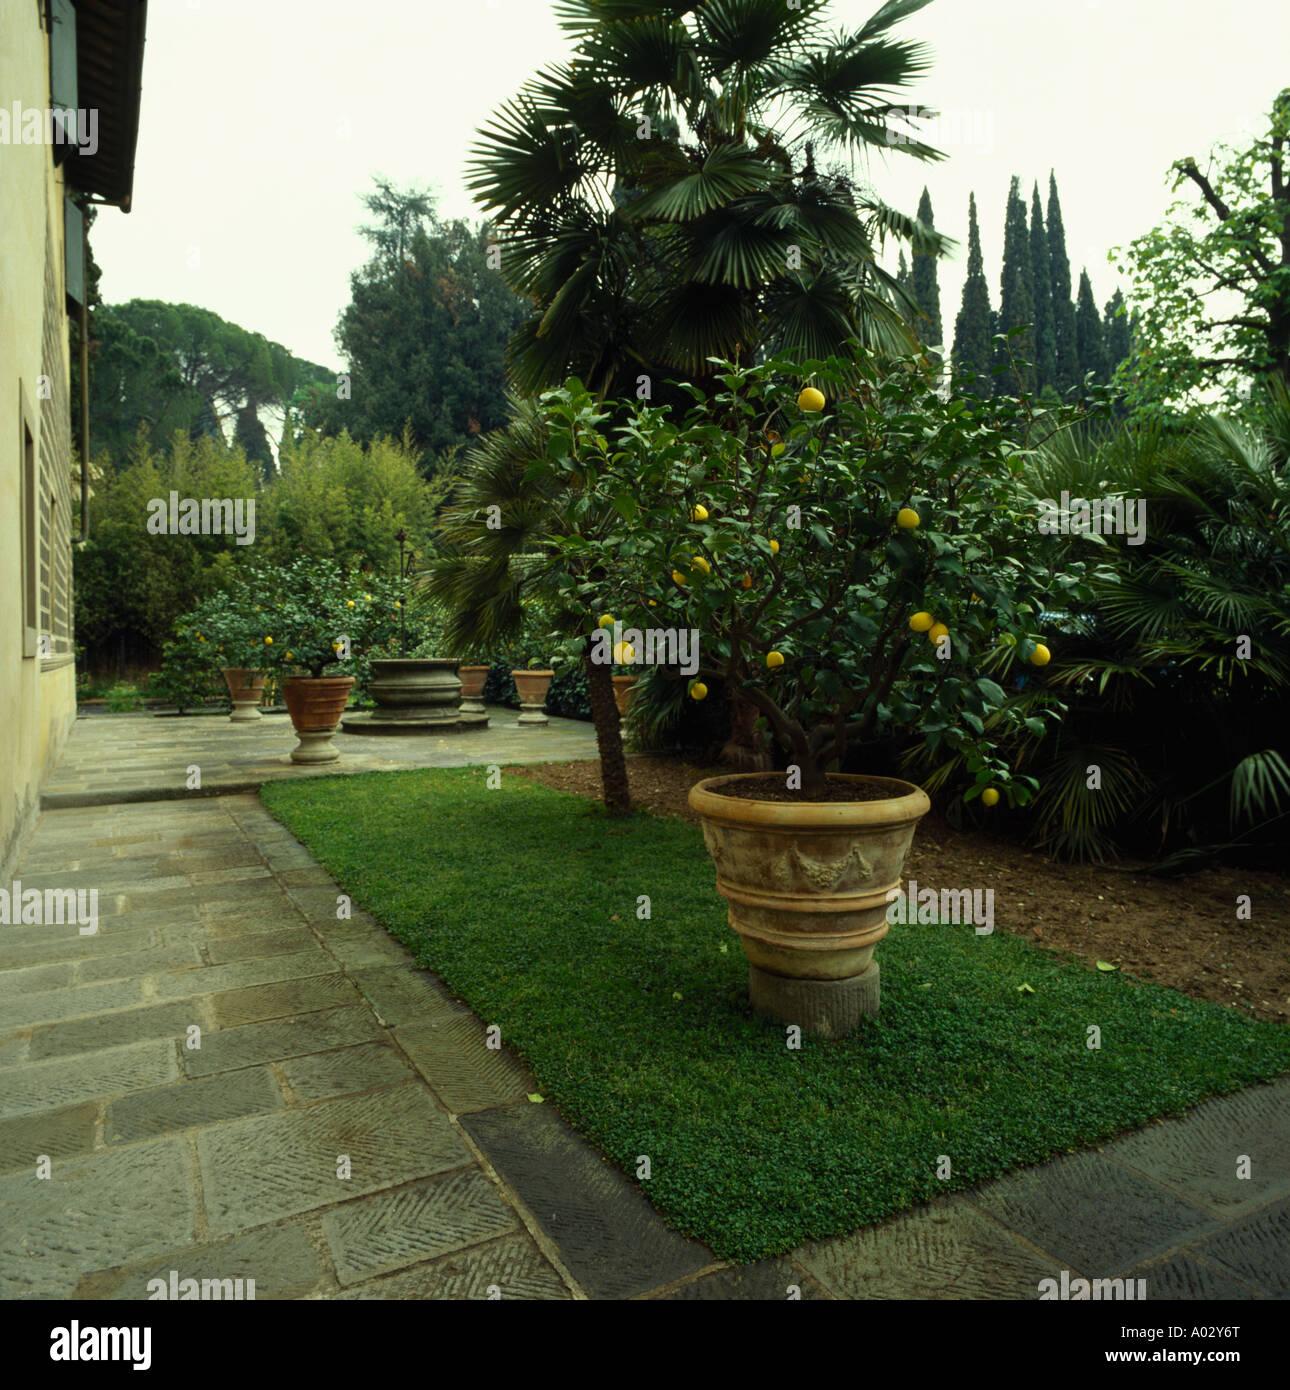 Arbre En Pot Terrasse grand pot en terre cuite avec des arbres d'agrumes sur la